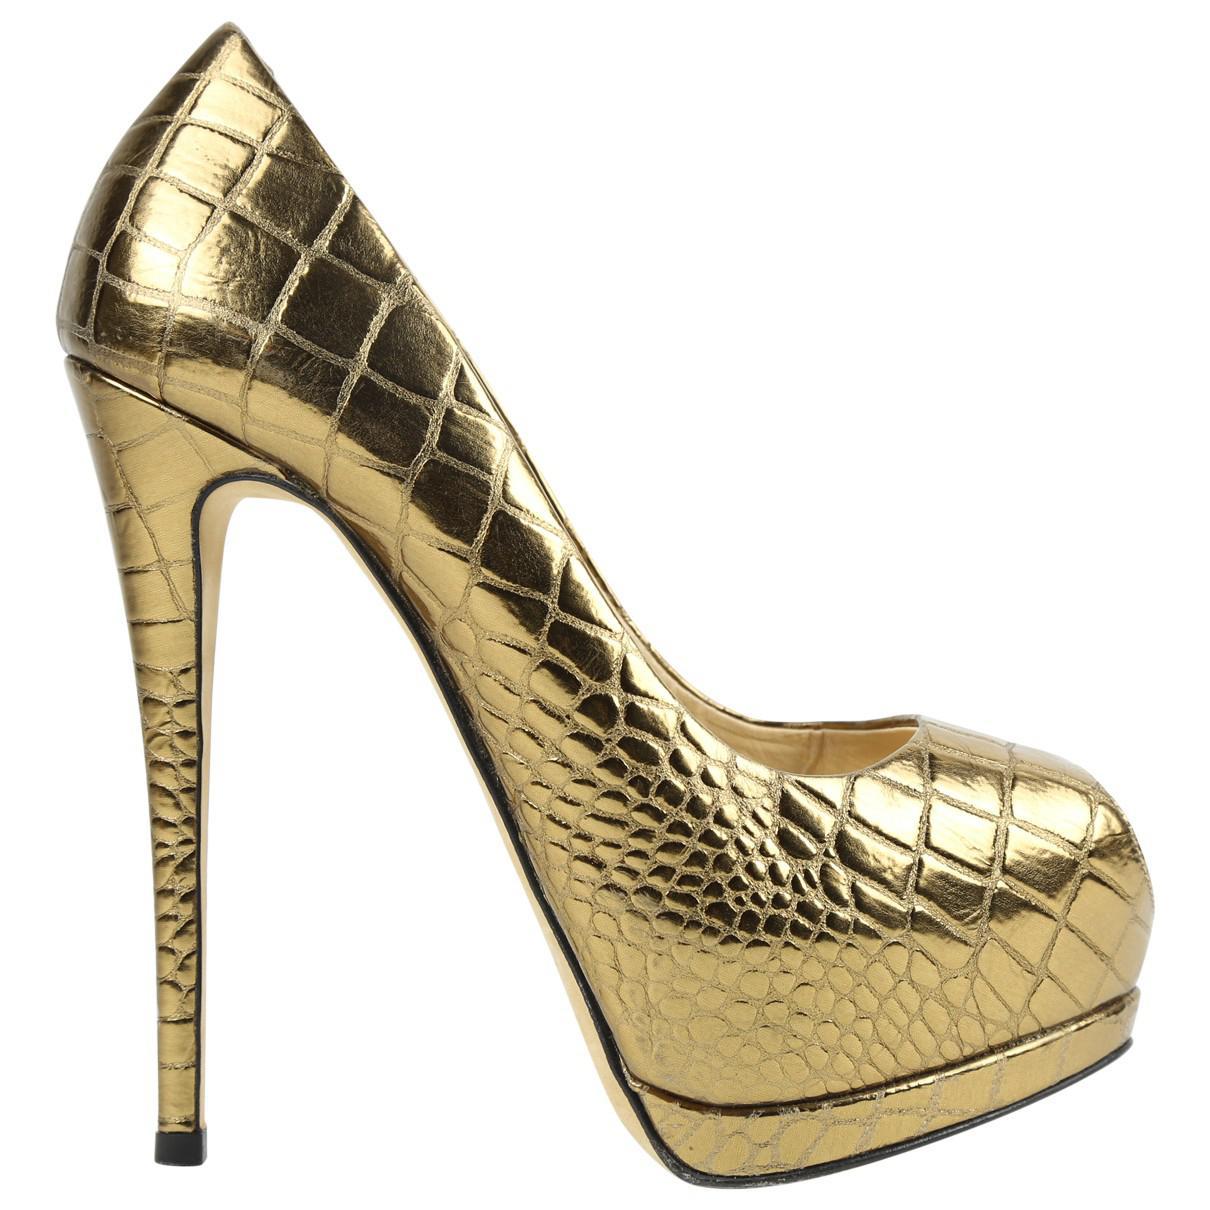 Pre-owned - Leather heels Giuseppe Zanotti UVAjF3hSYi